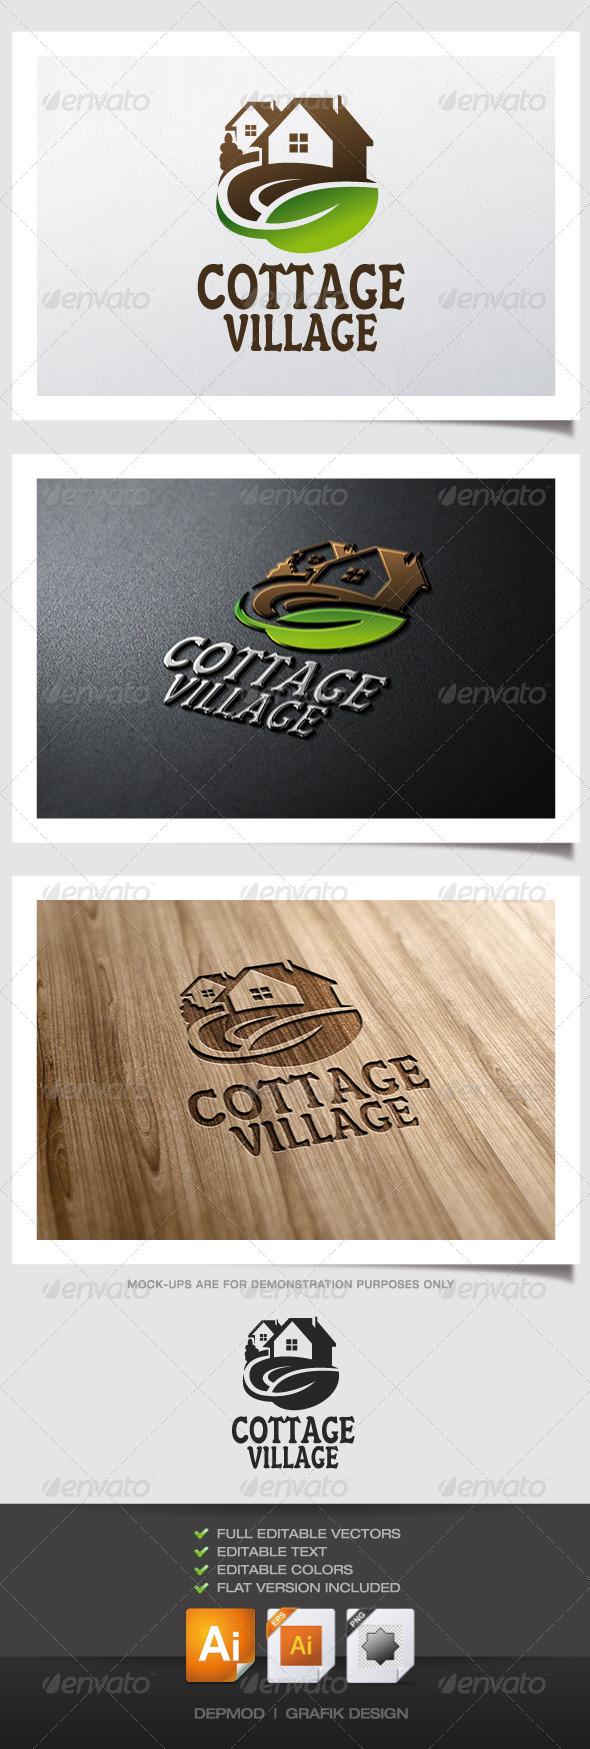 GraphicRiver Cottage Village Logo 5199844